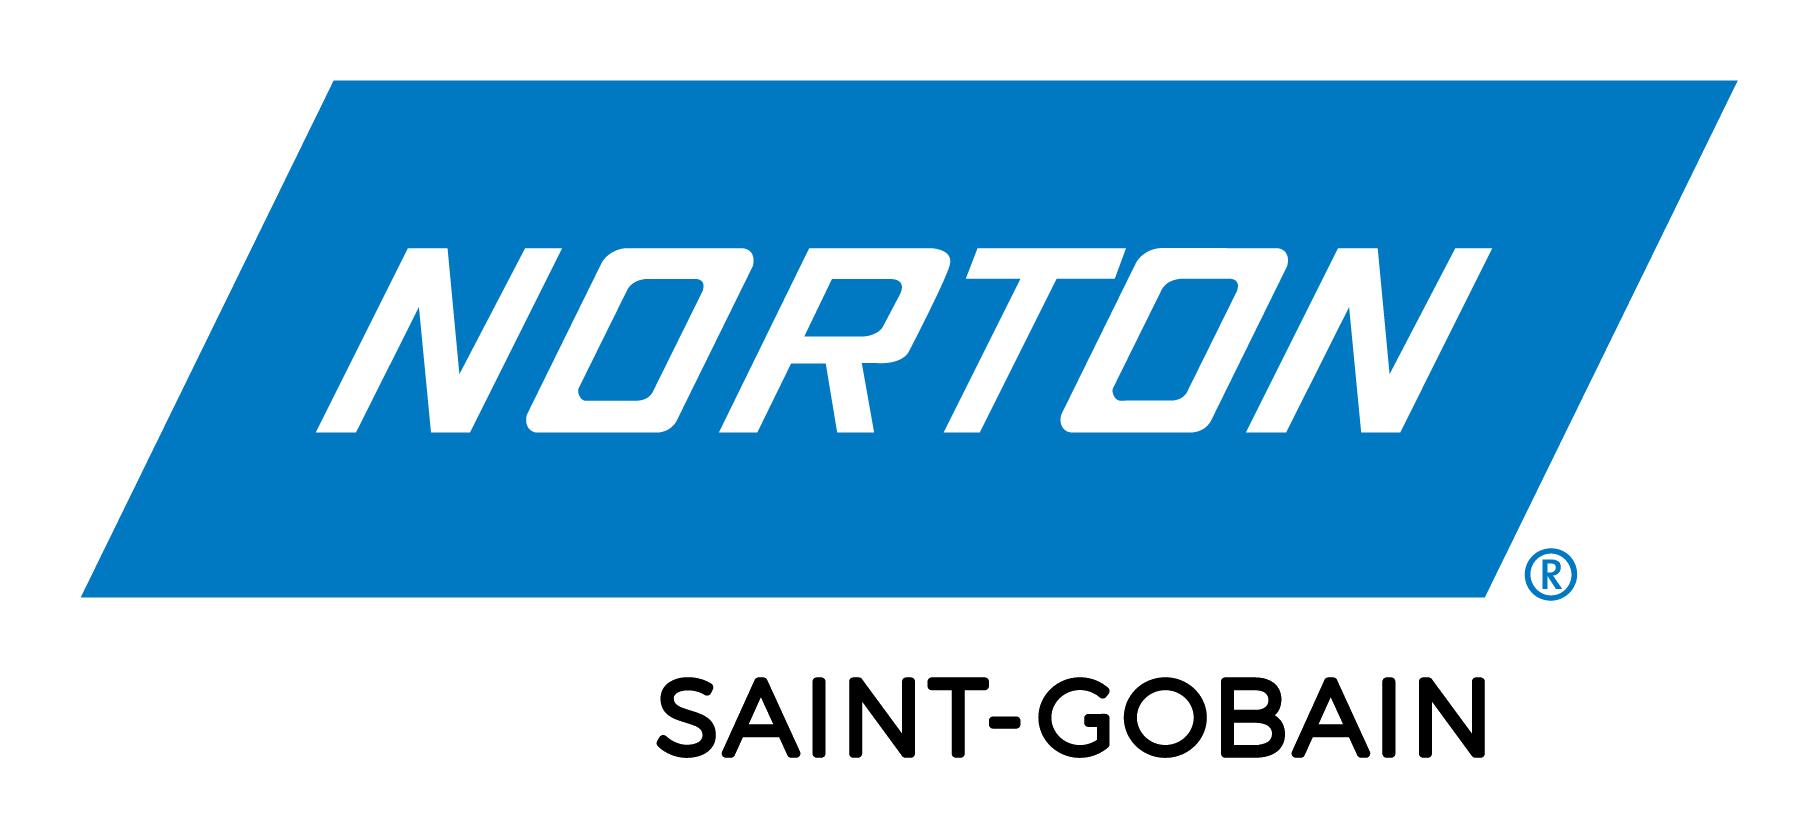 SG_Norton_logo_rgb_27